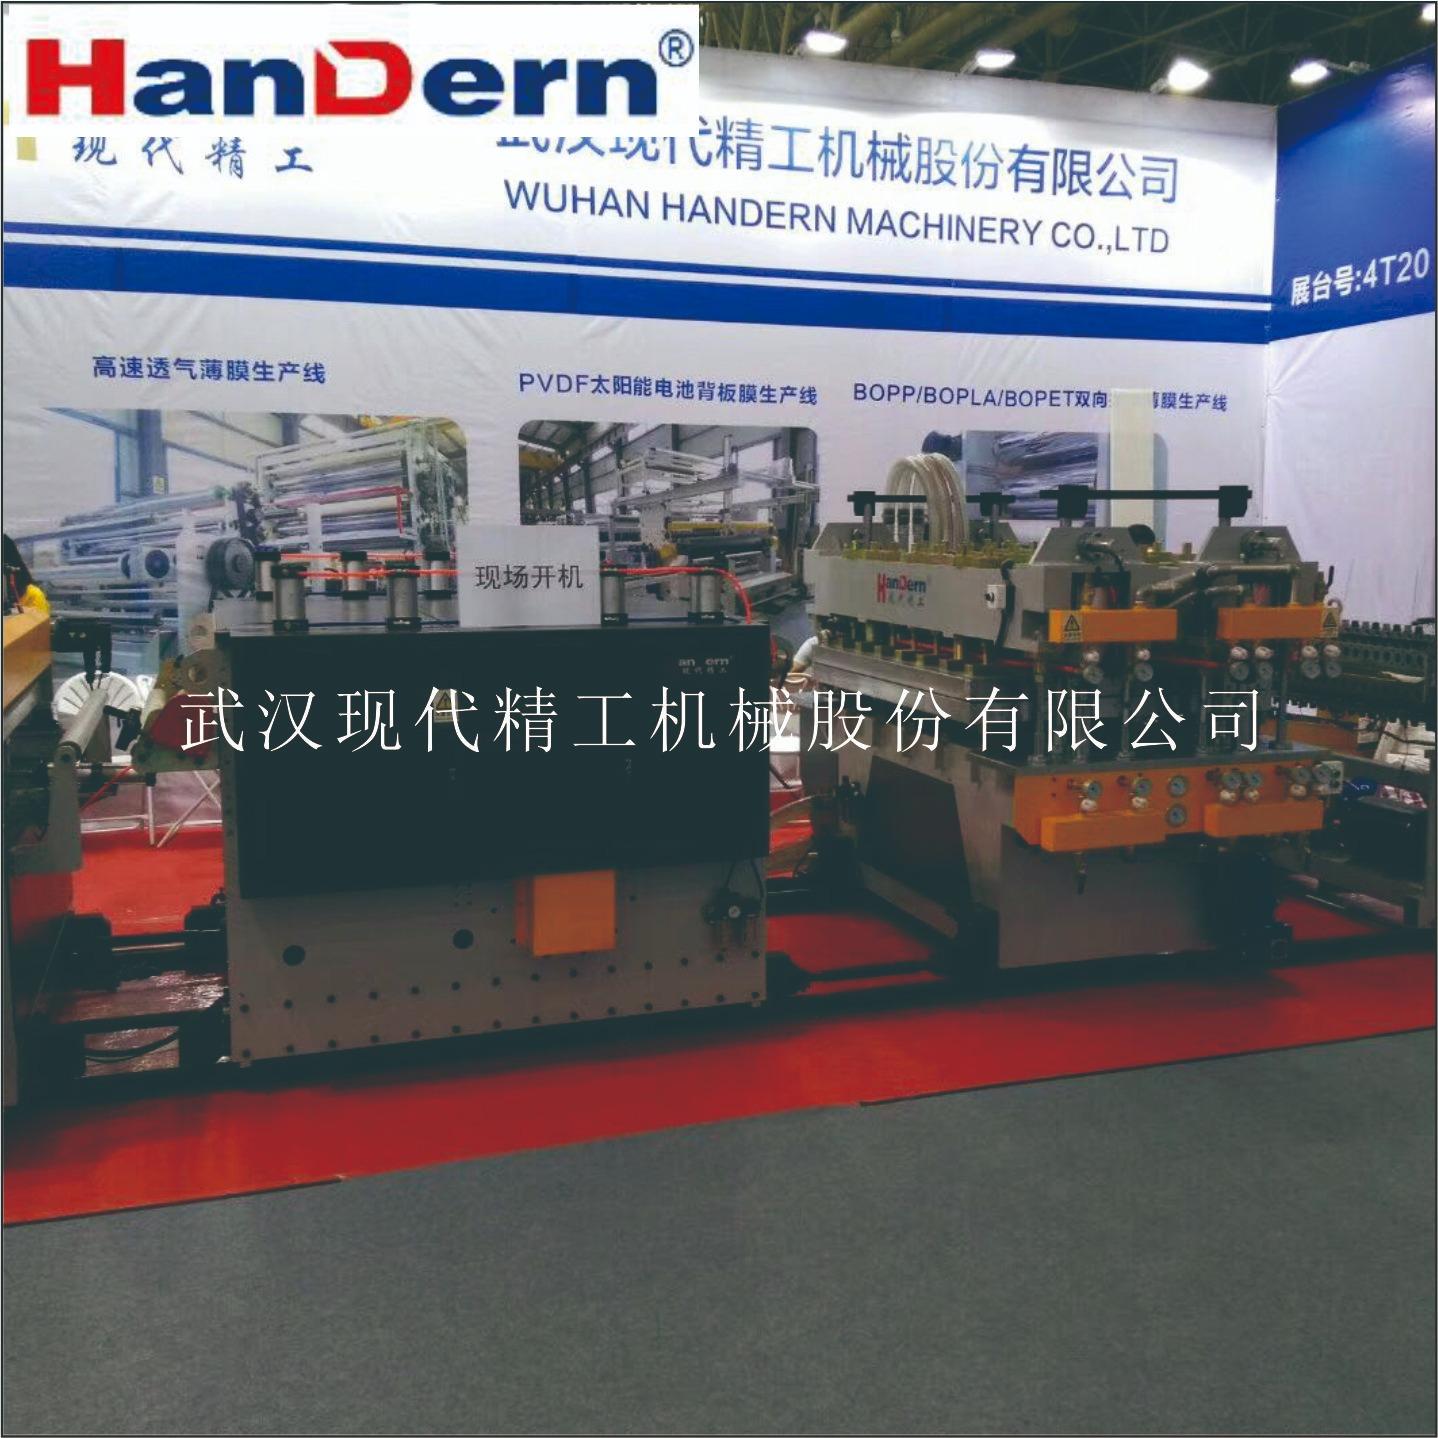 PP中空板、中空板设备、中空板机械